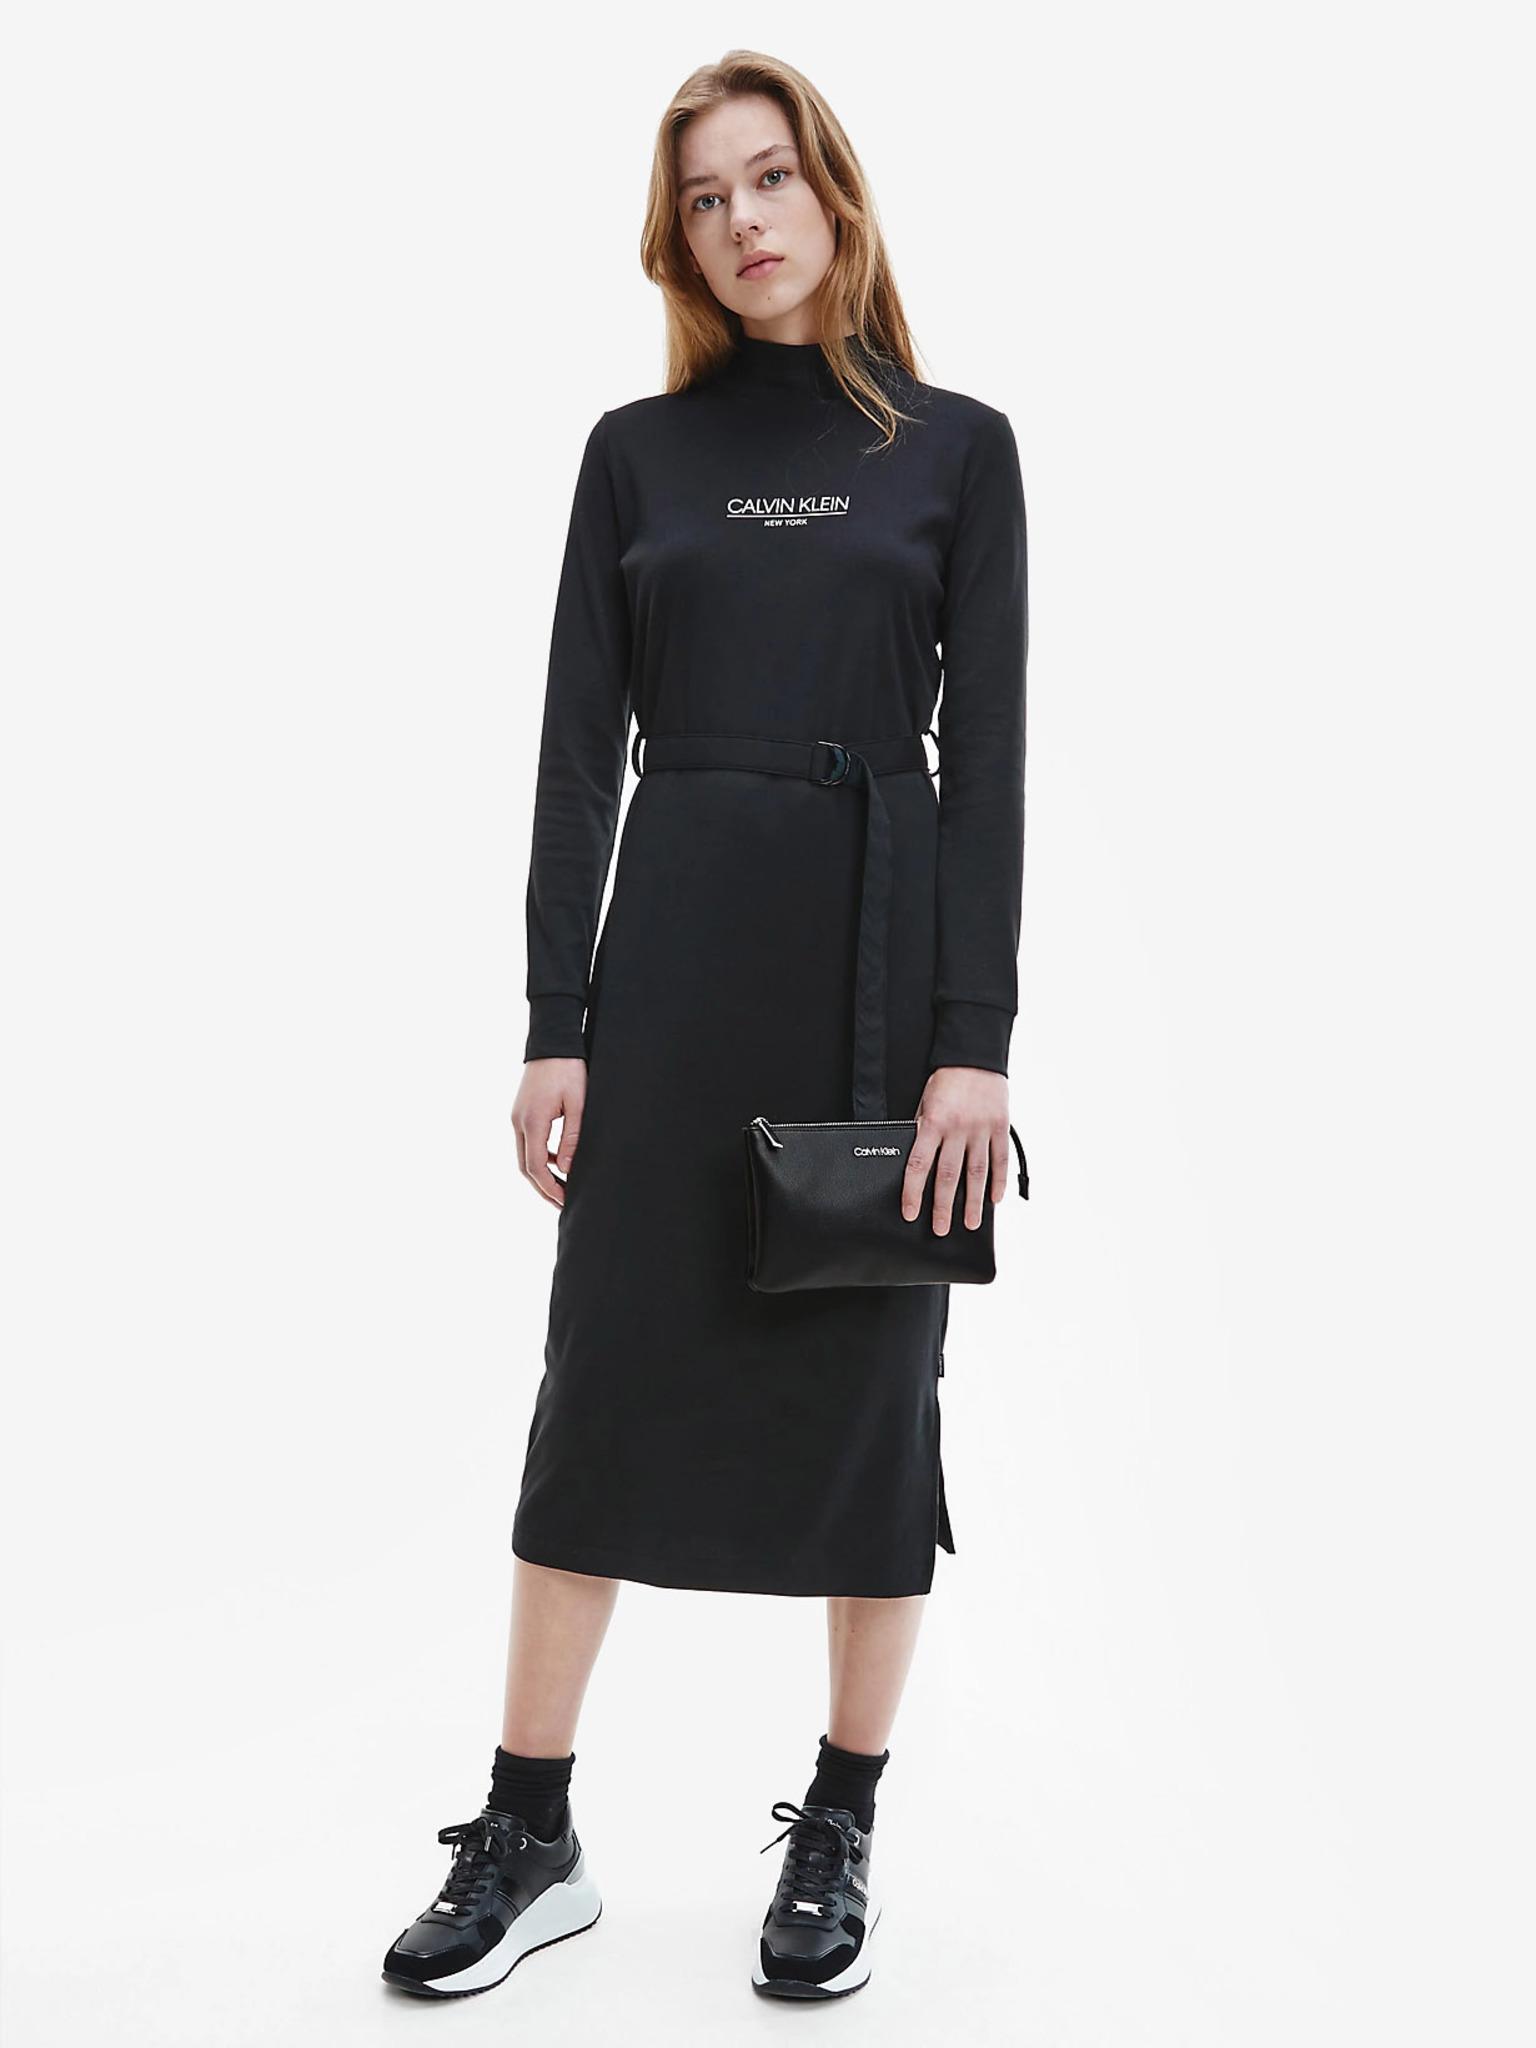 Calvin Klein negre crossbody geanta Must